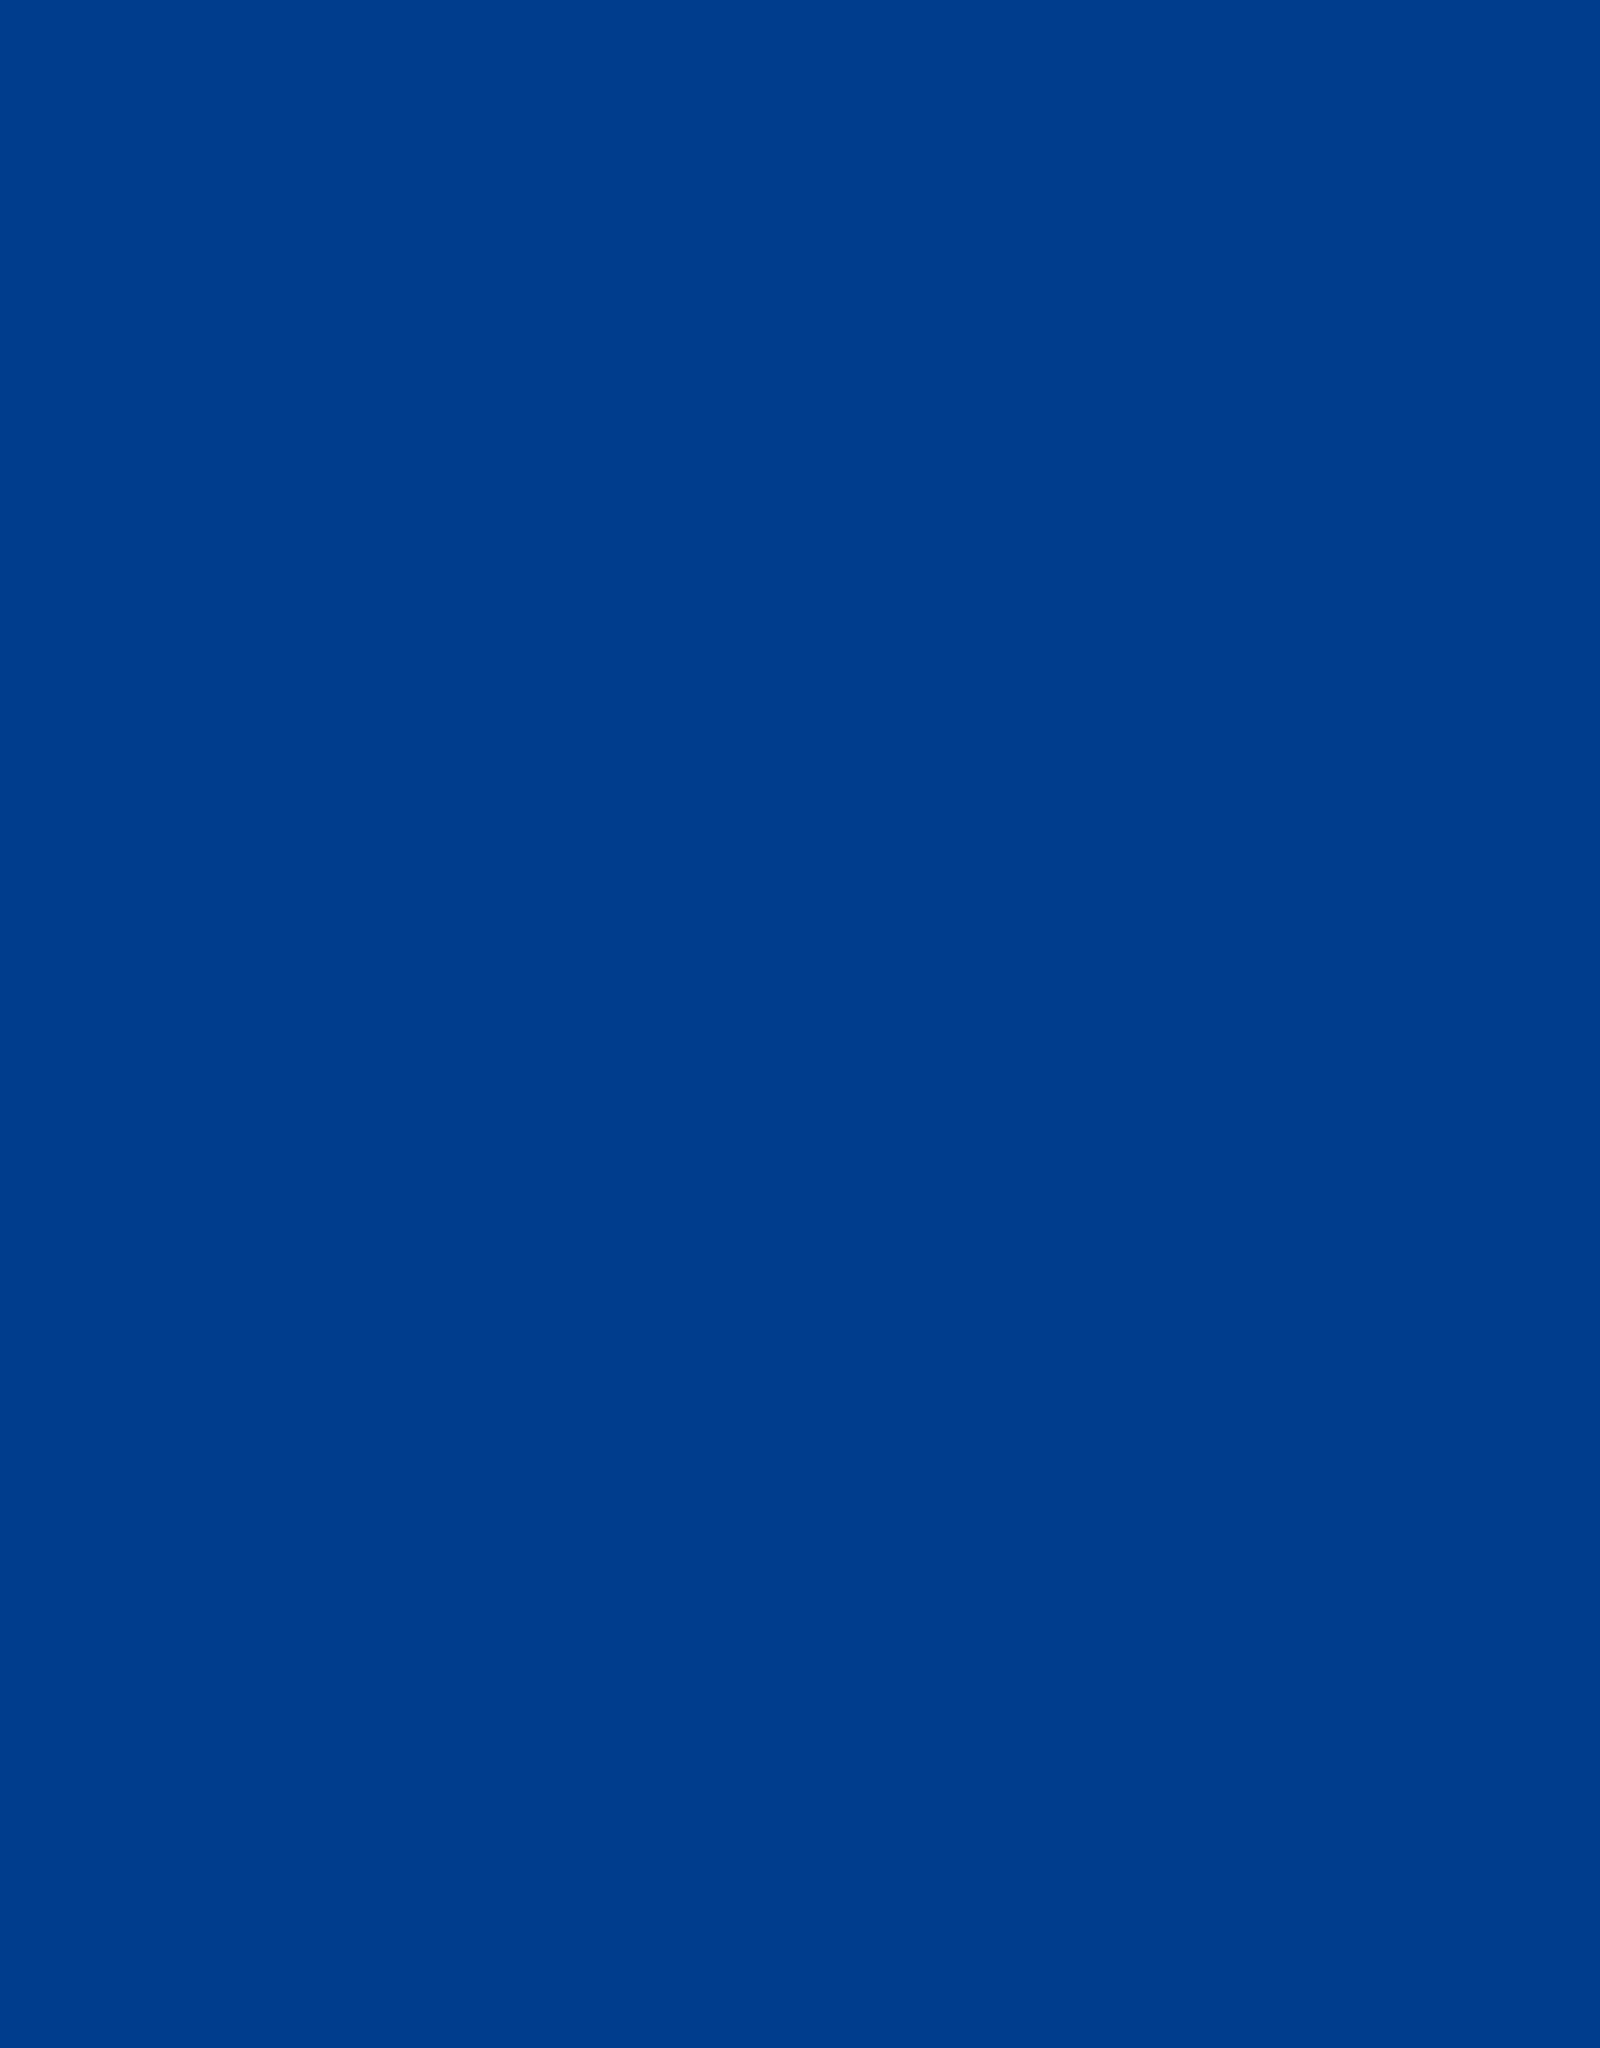 Trapsuutjies Cobalt Blue Large